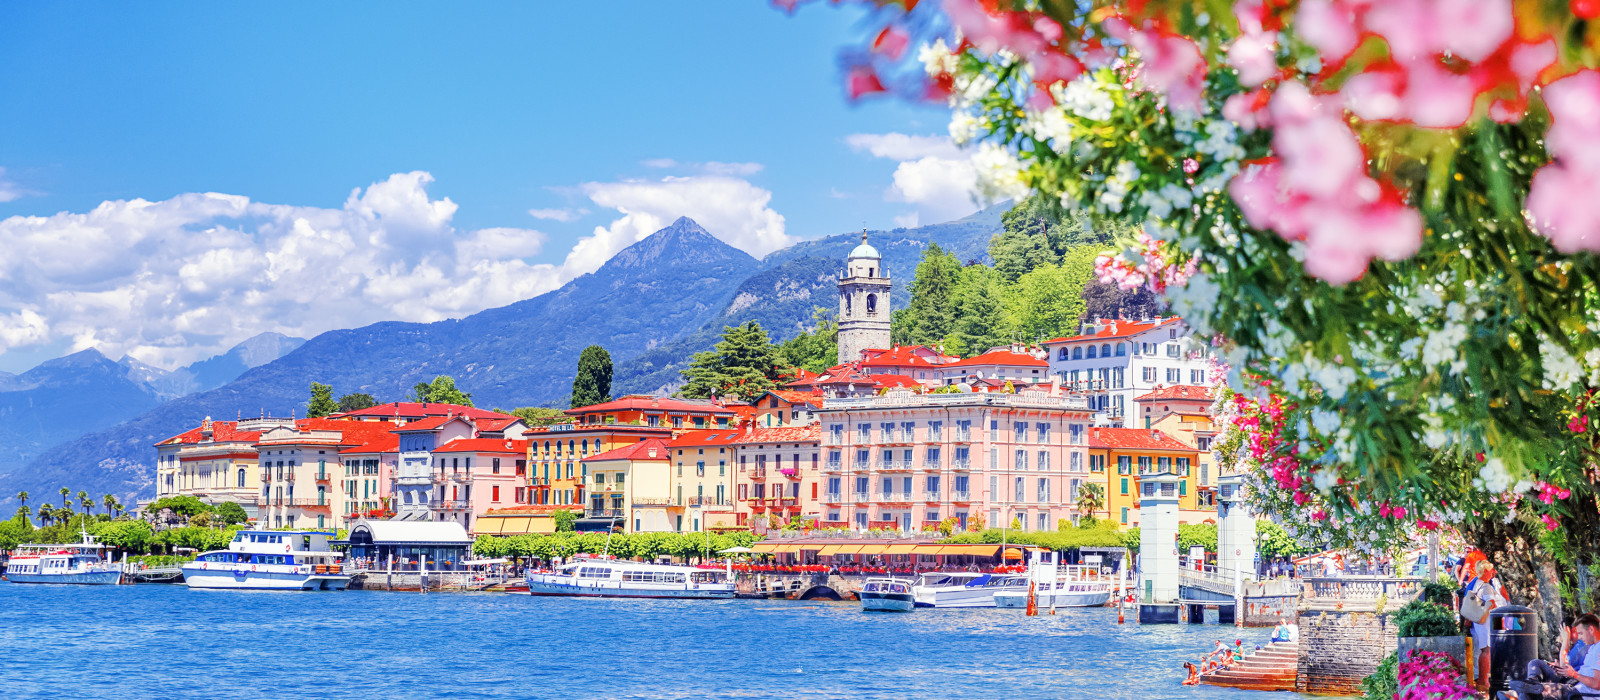 Destination Bellagio Italy